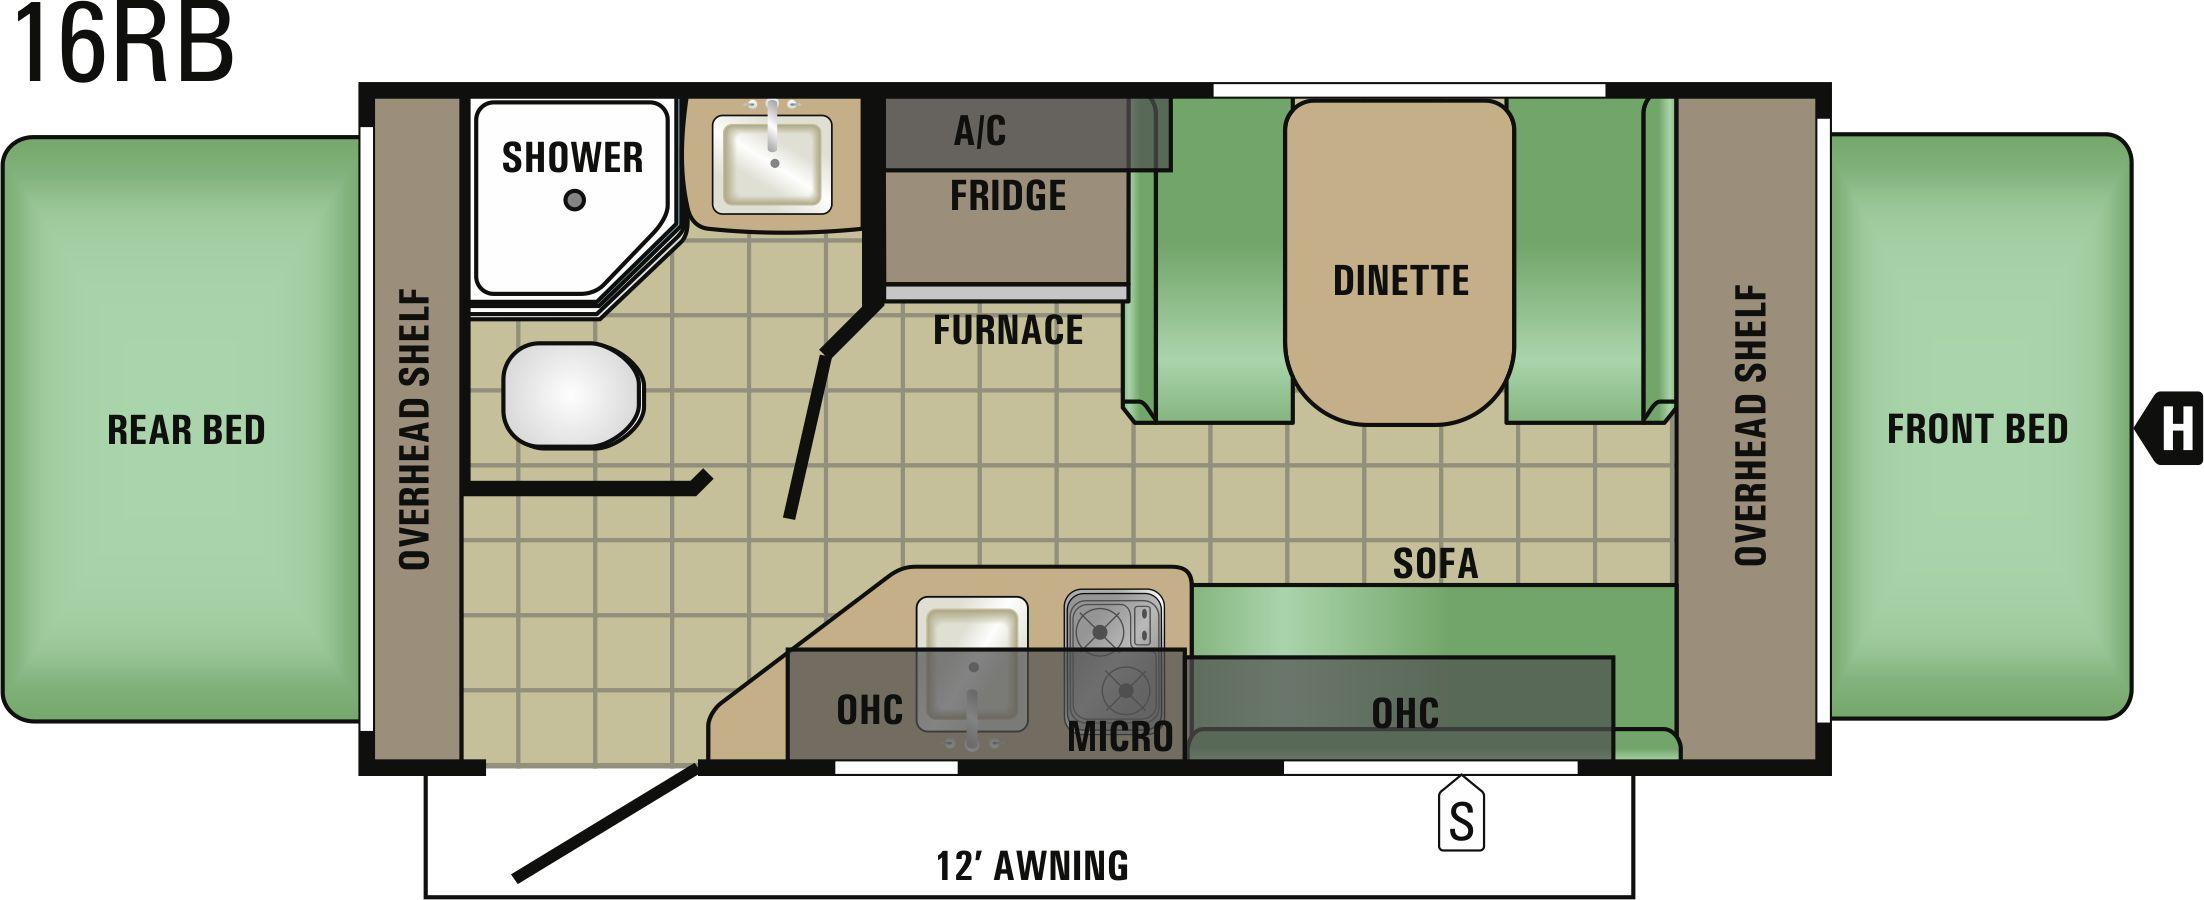 16RB Floorplan